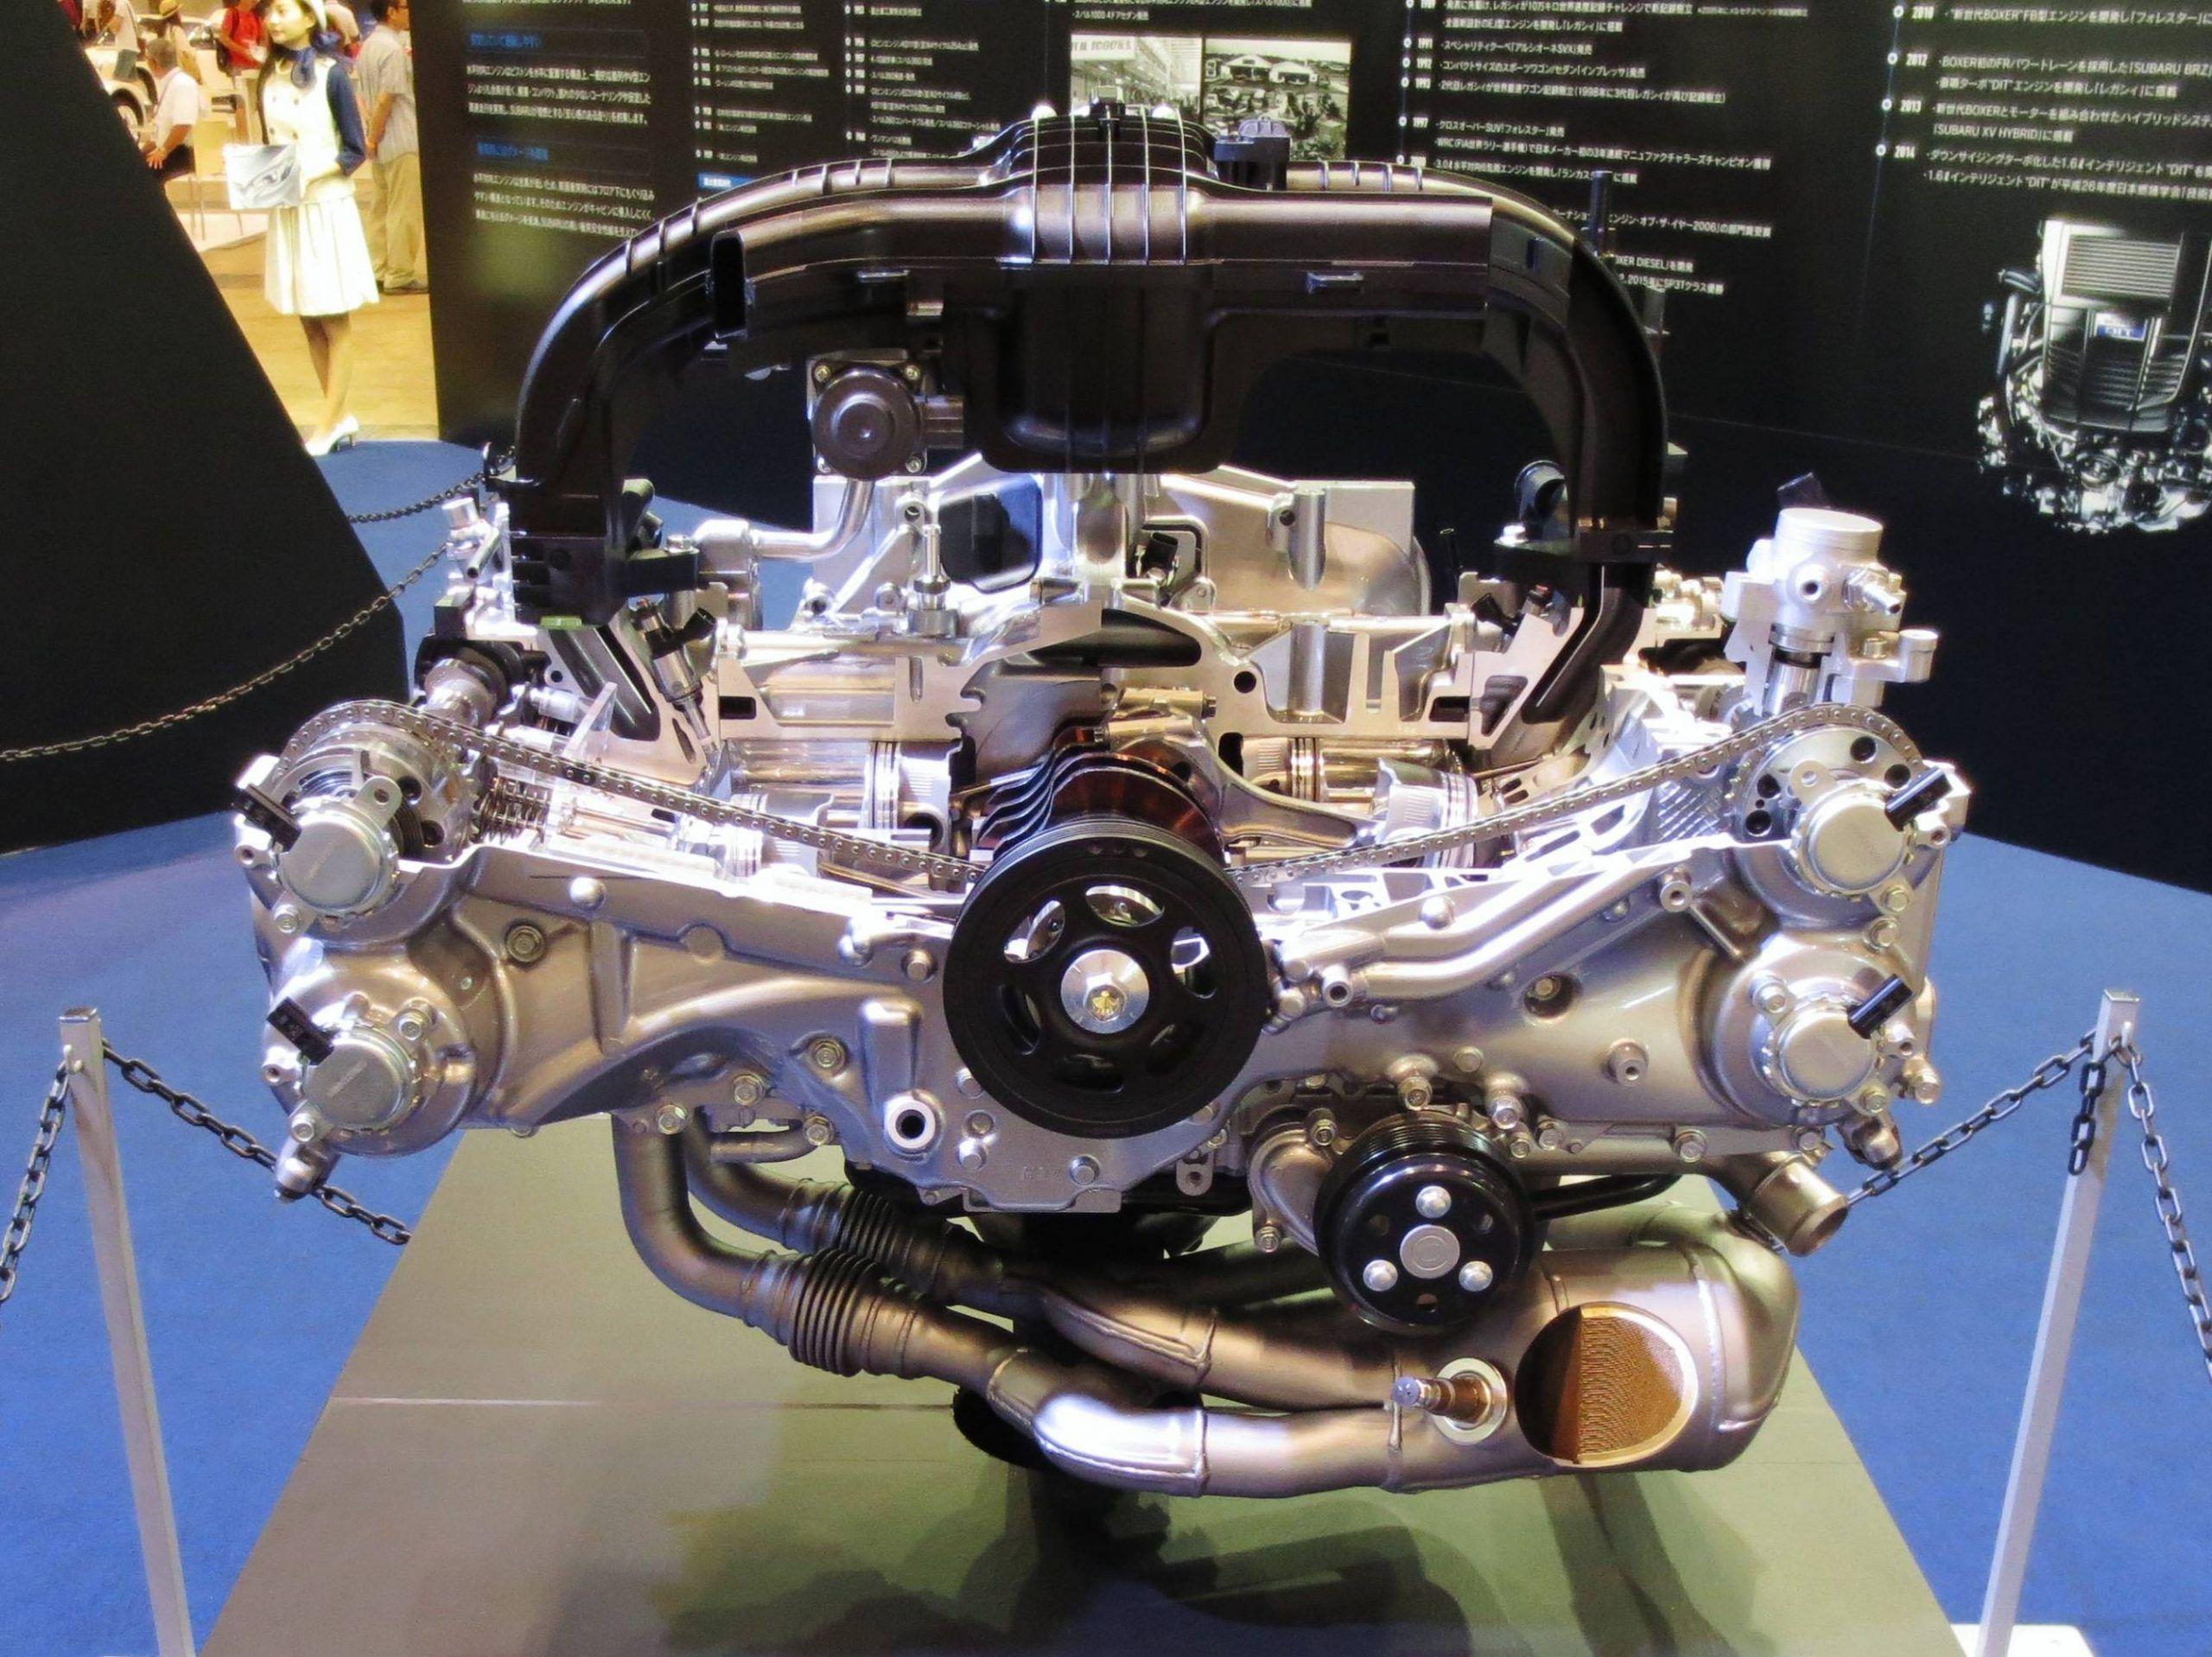 Subaru Engines 2020 Performance And New Engine Di 2020